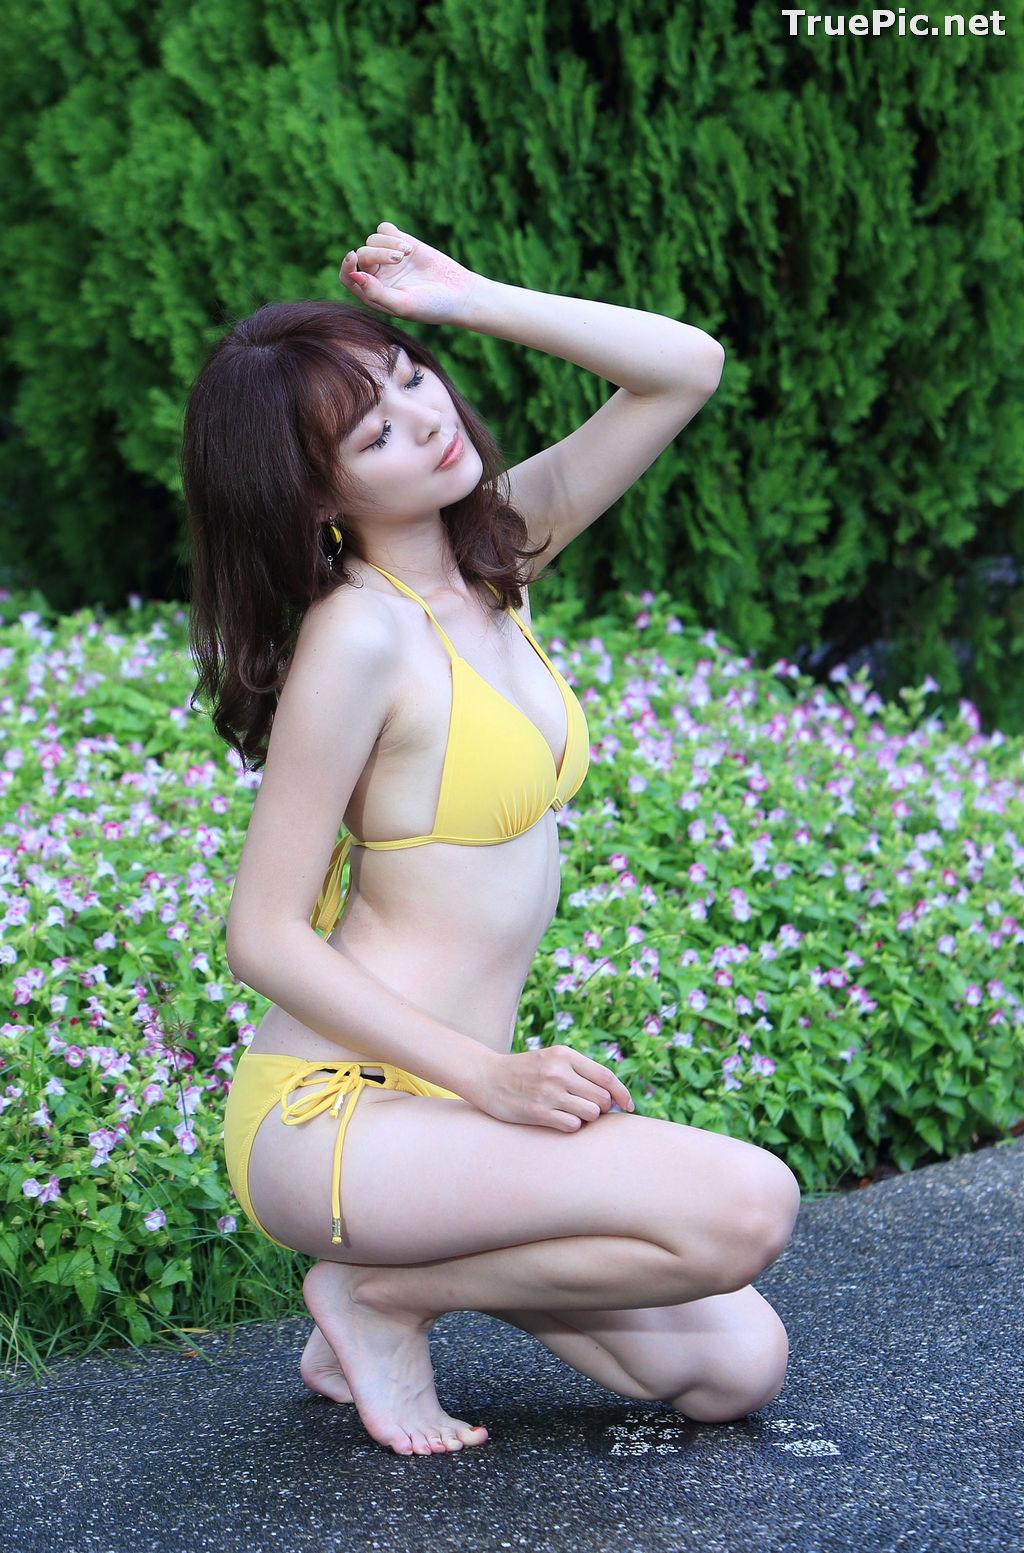 Image Taiwanese Model - Ash Ley - Yellow Bikini at Taipei Water Museum - TruePic.net - Picture-46